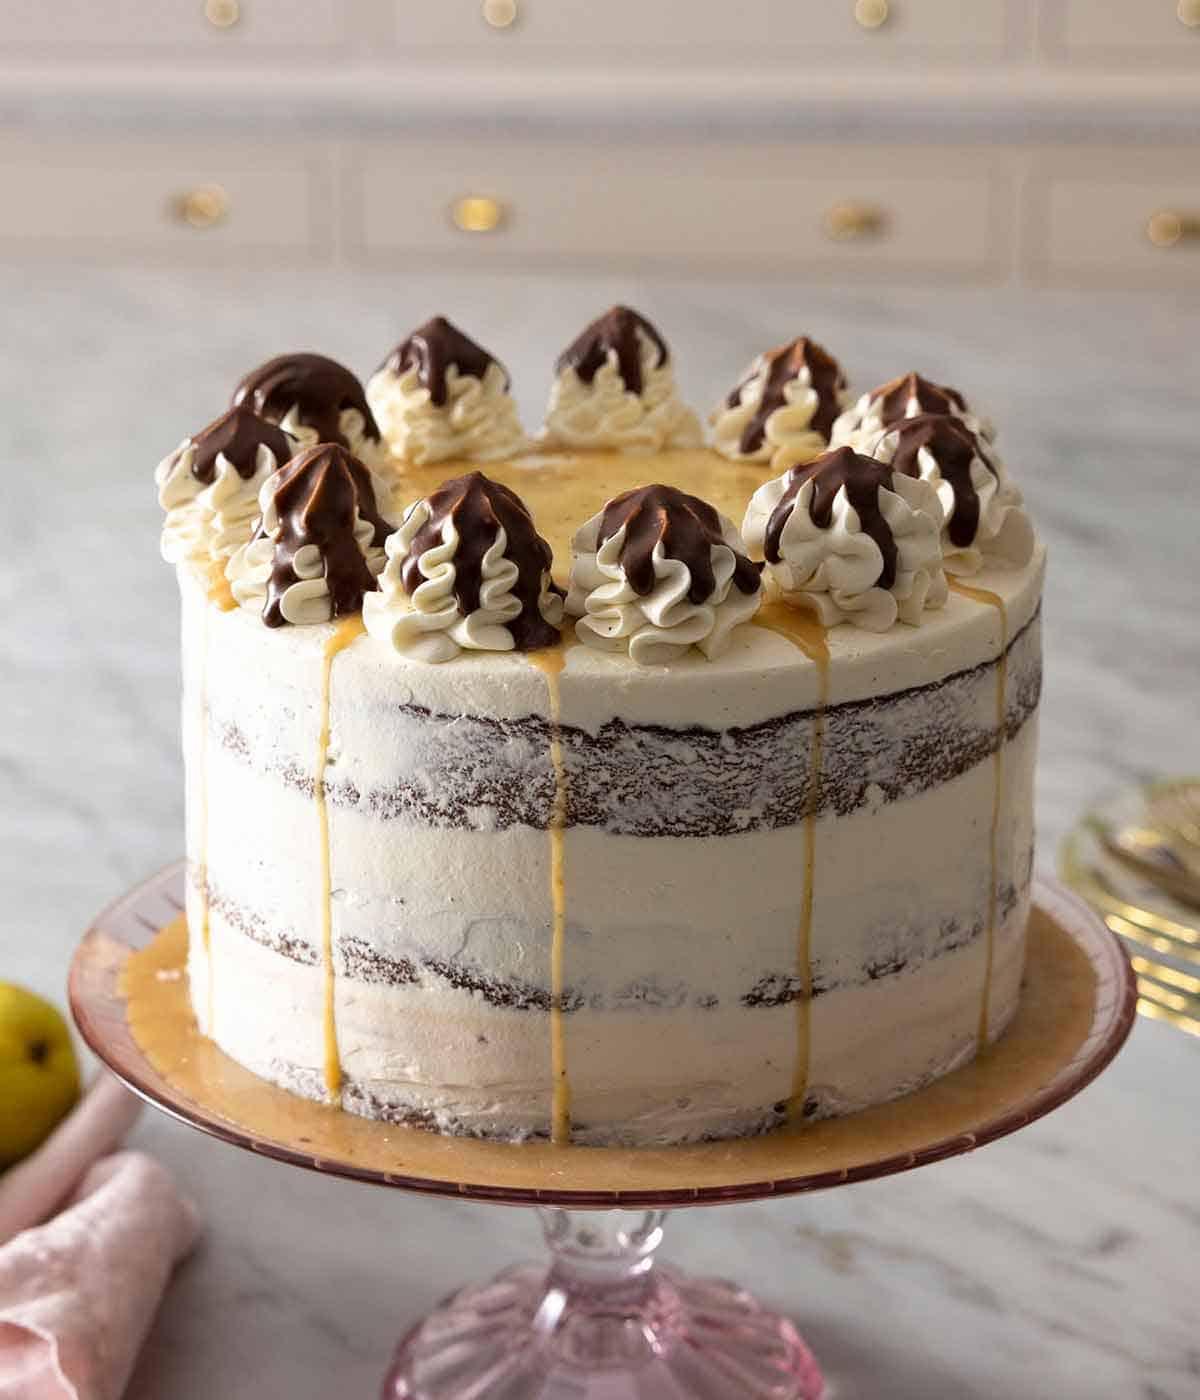 A chocolate pear cake on a cake stand.